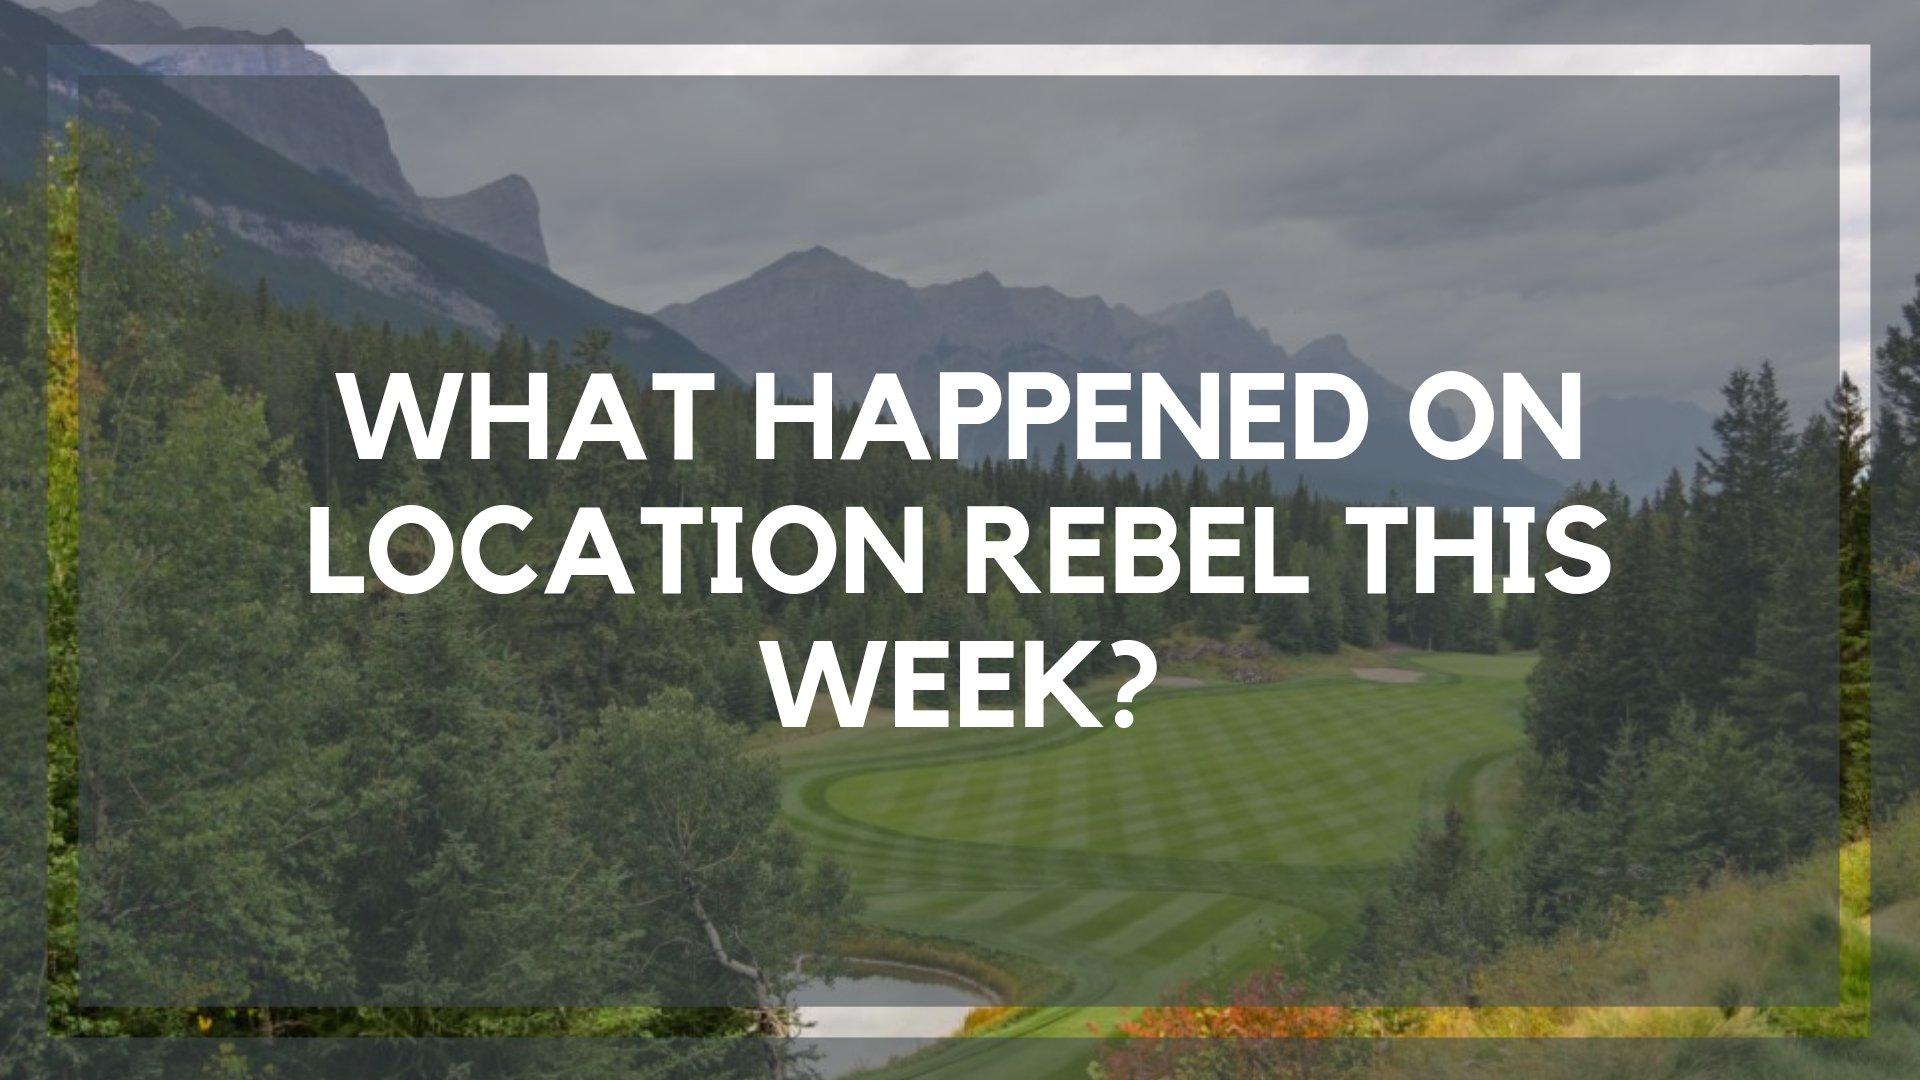 What Happened on Location Rebel This Week?